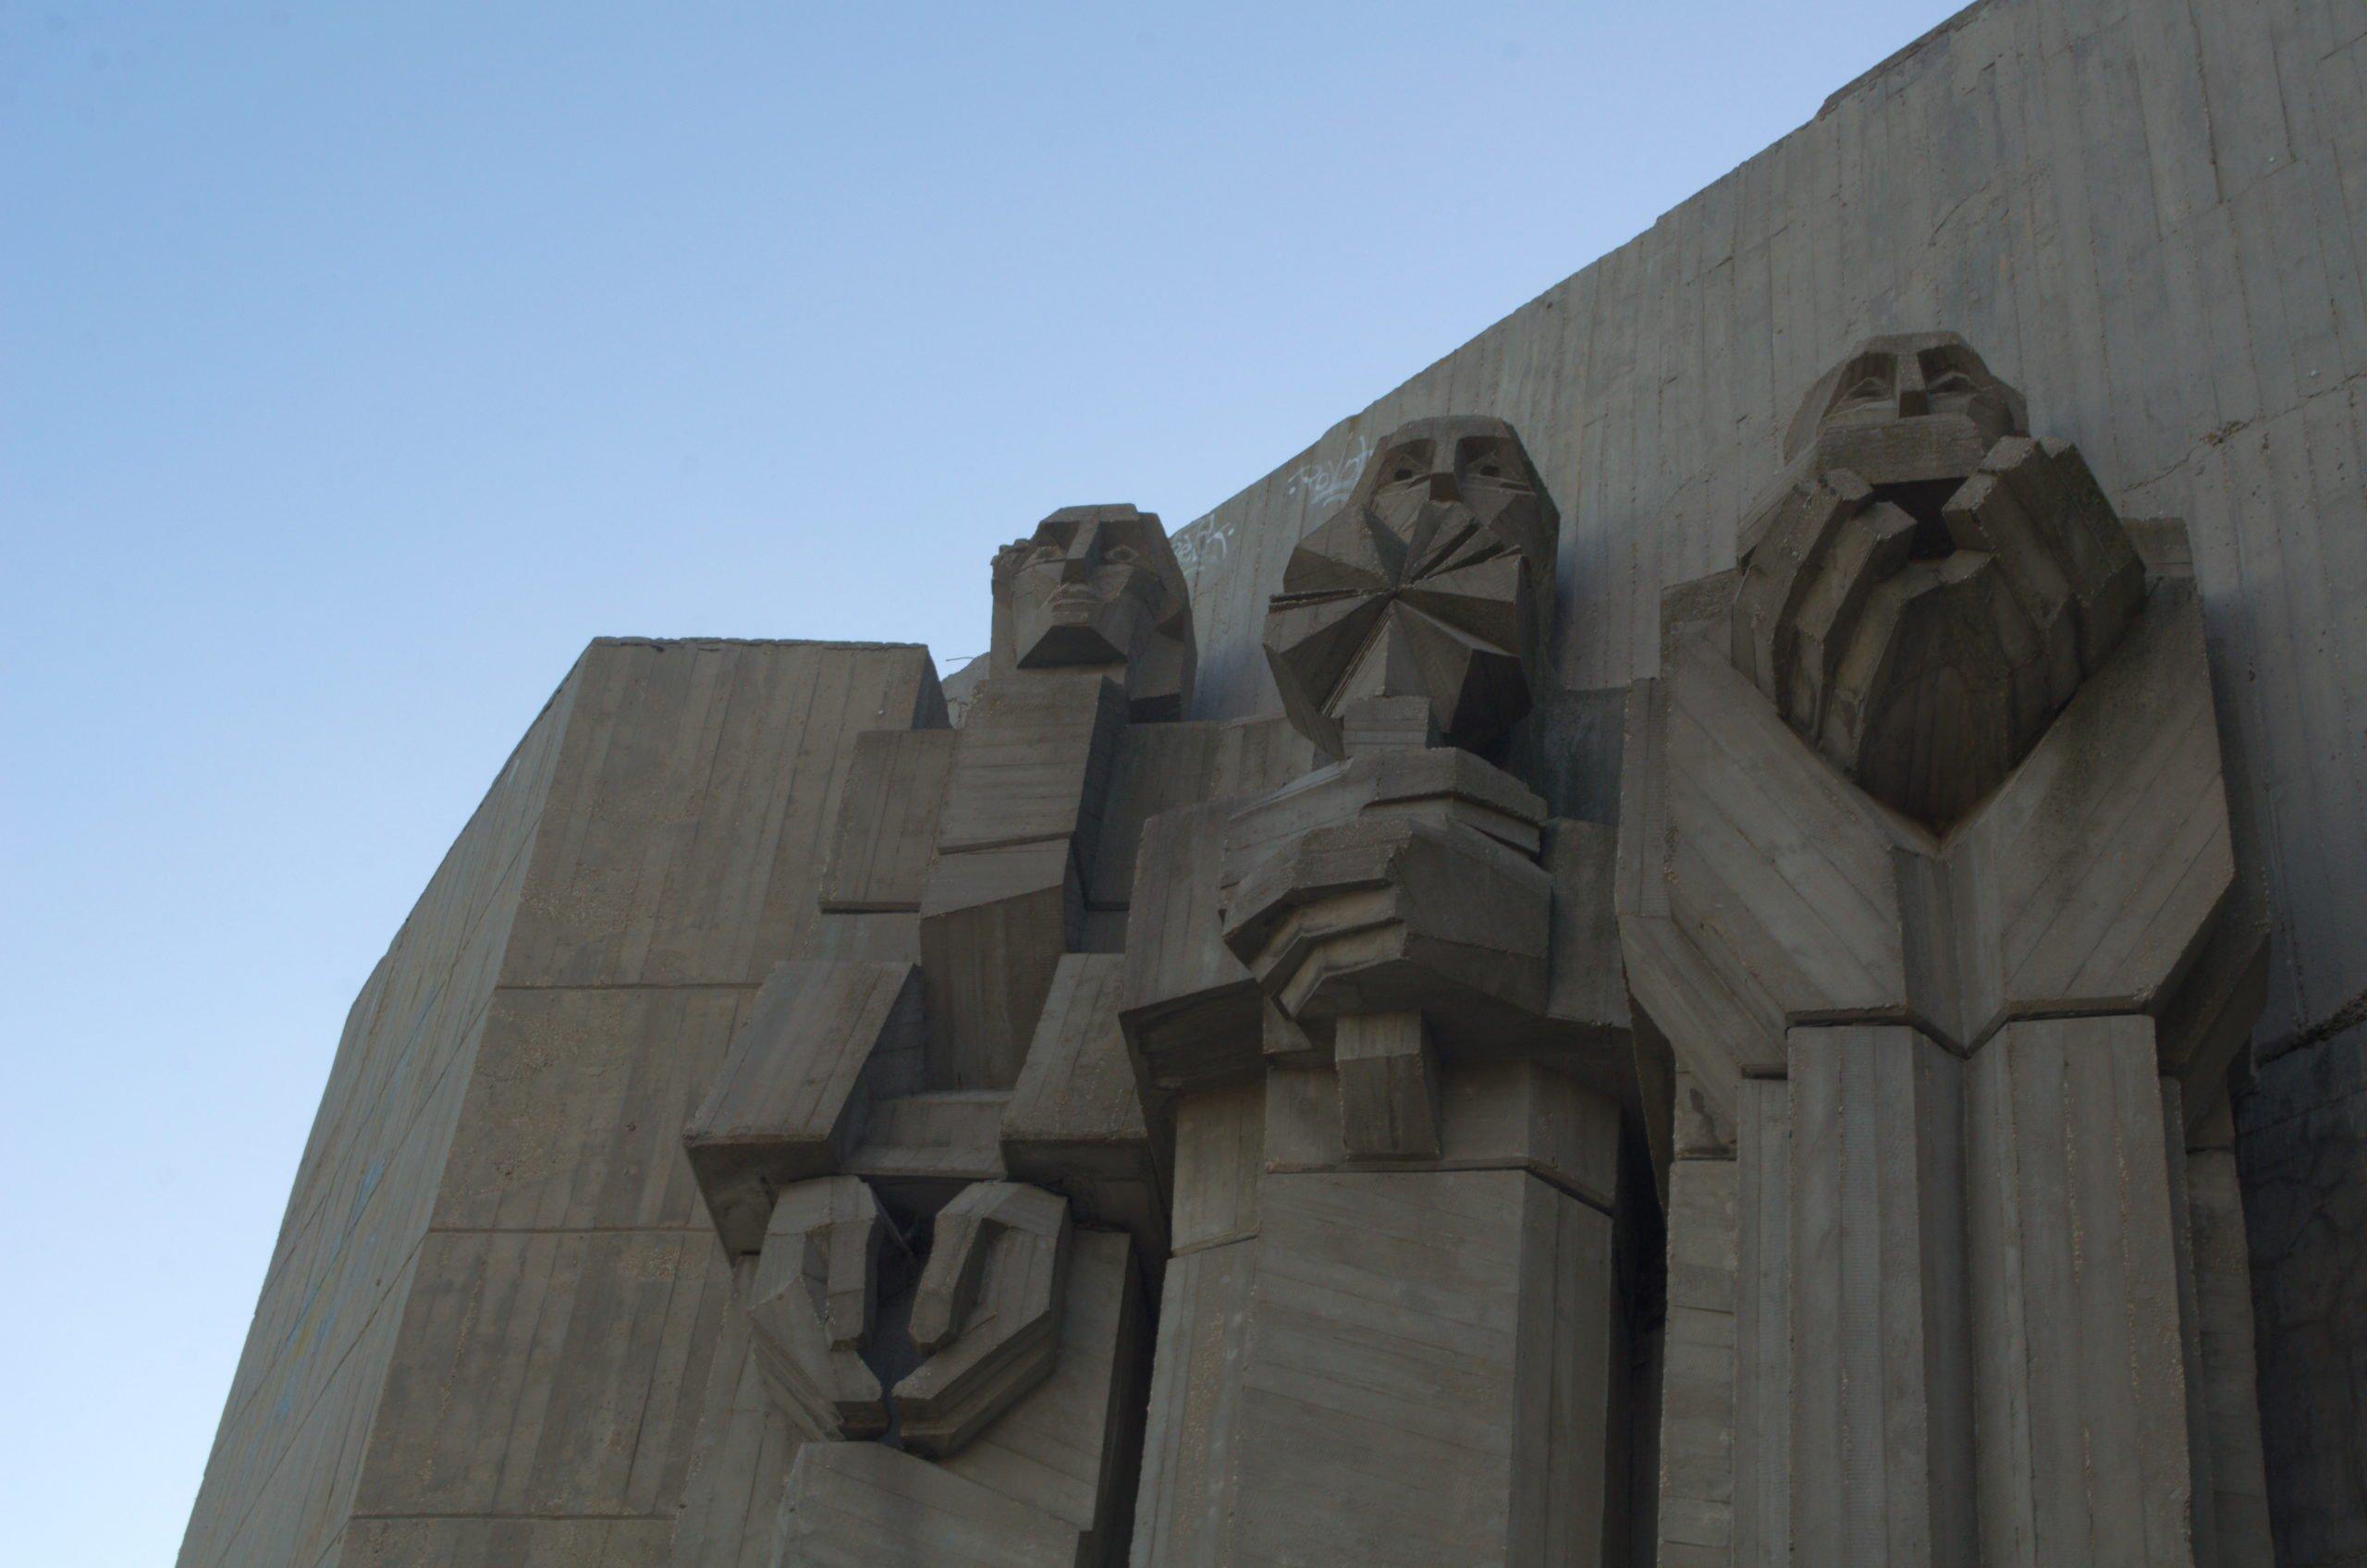 Communist era Sculptures in Bulgaria By trabantos.